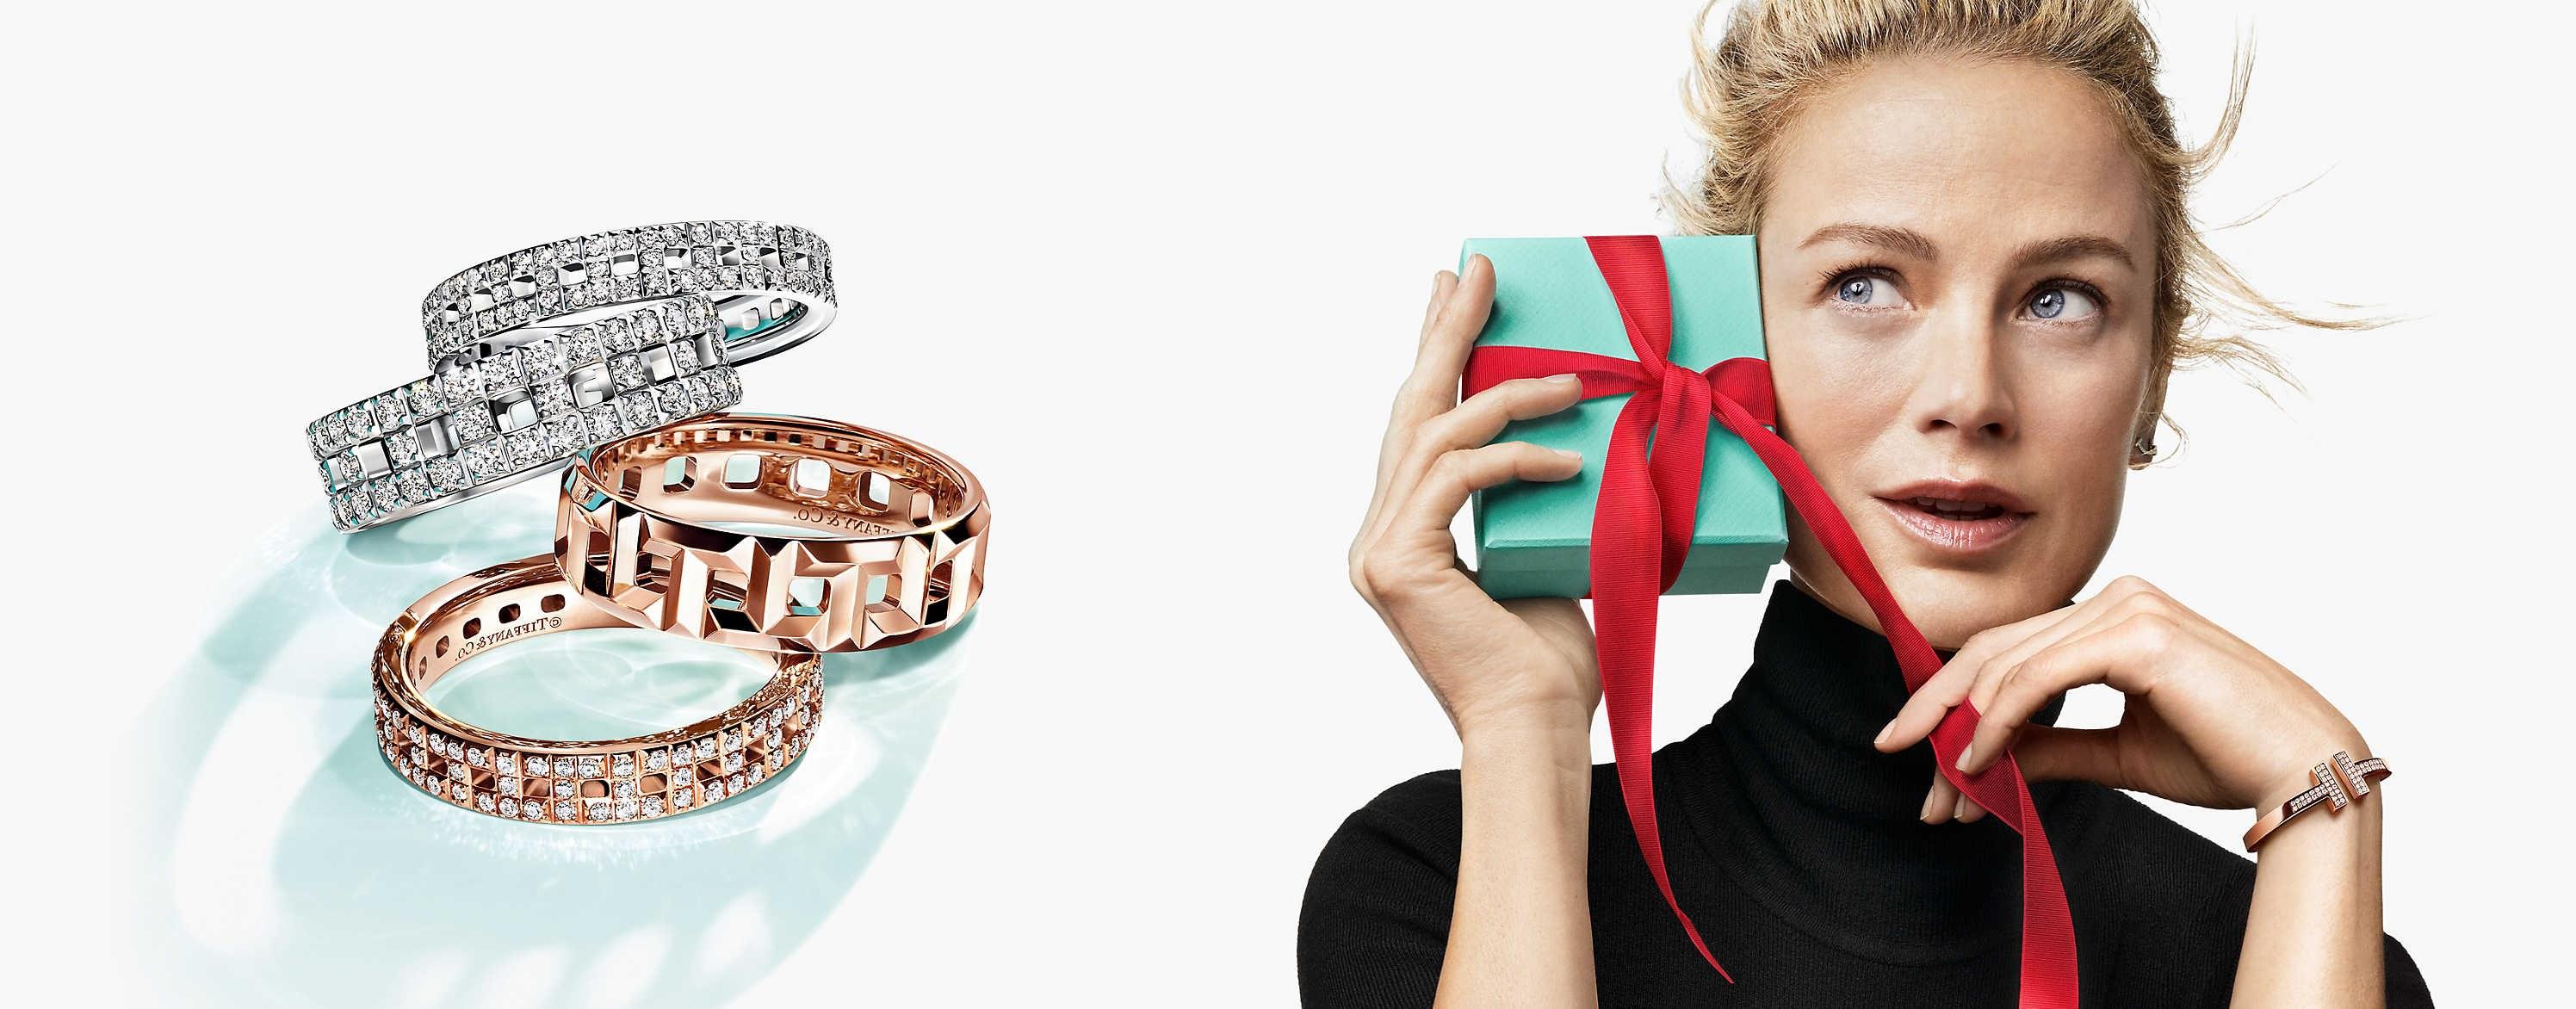 Design Seragam Gamis Pernikahan 8ydm Tiffany & Co Ficial